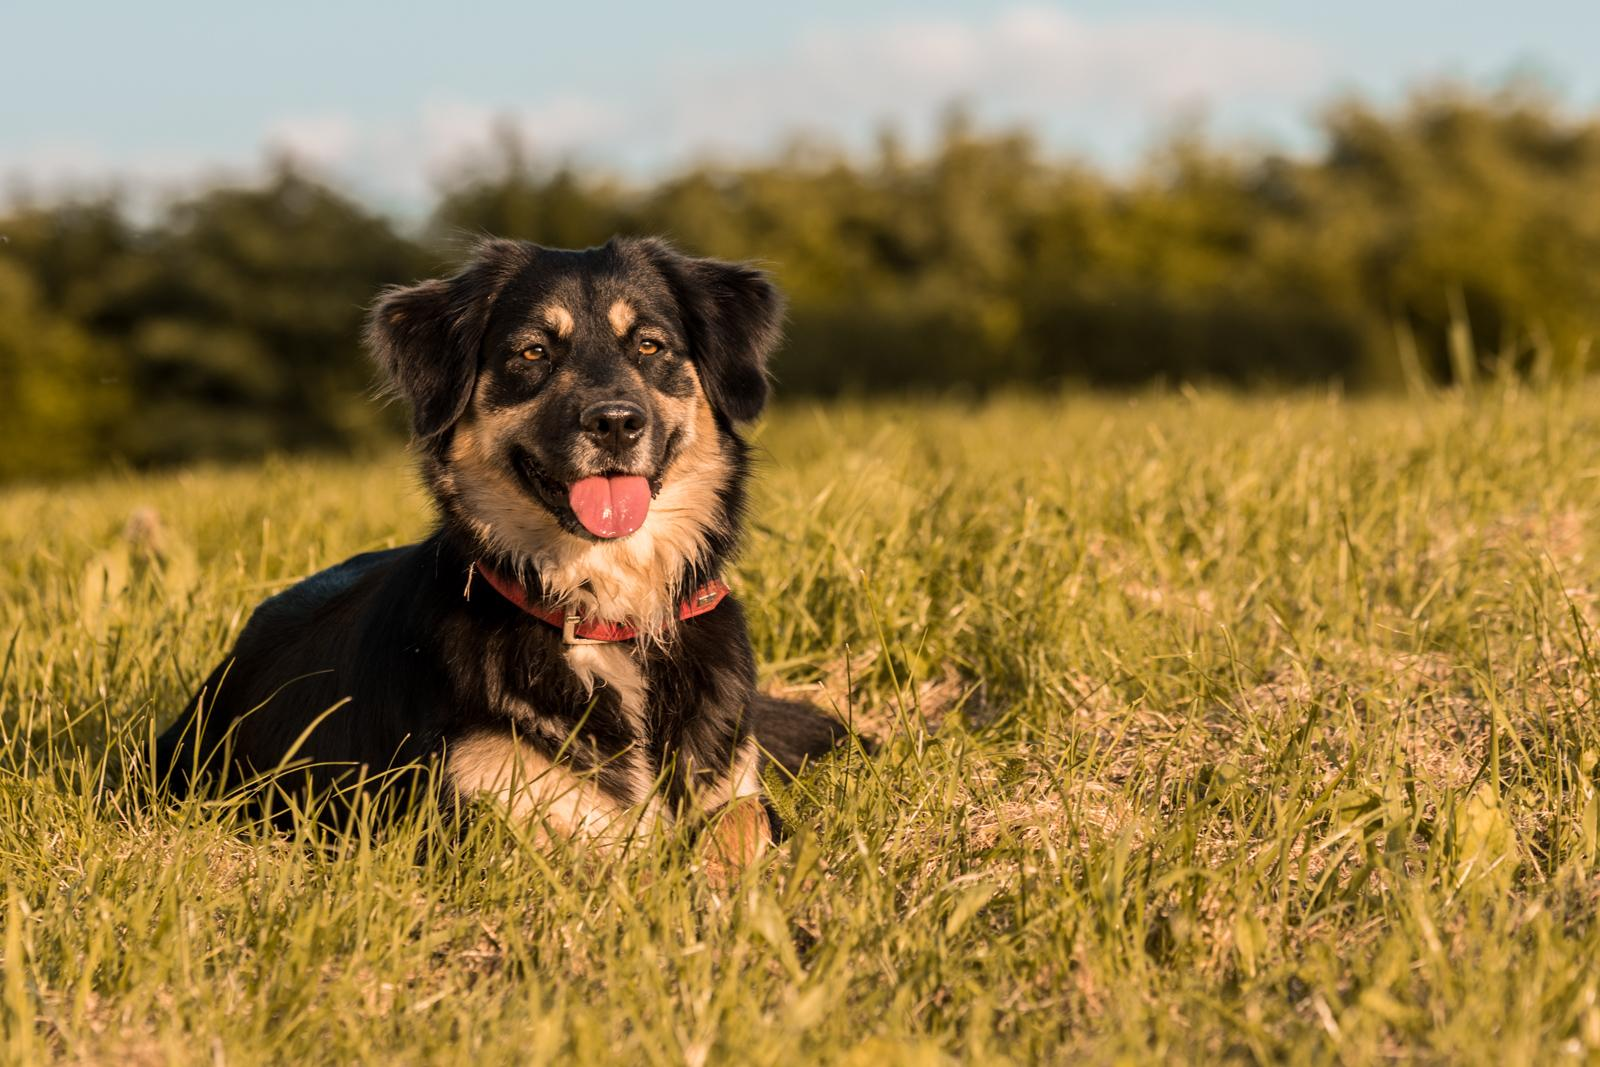 Tierfotograf-Labrador-Sven's Bildwerke-Hund-Hundefotografie13